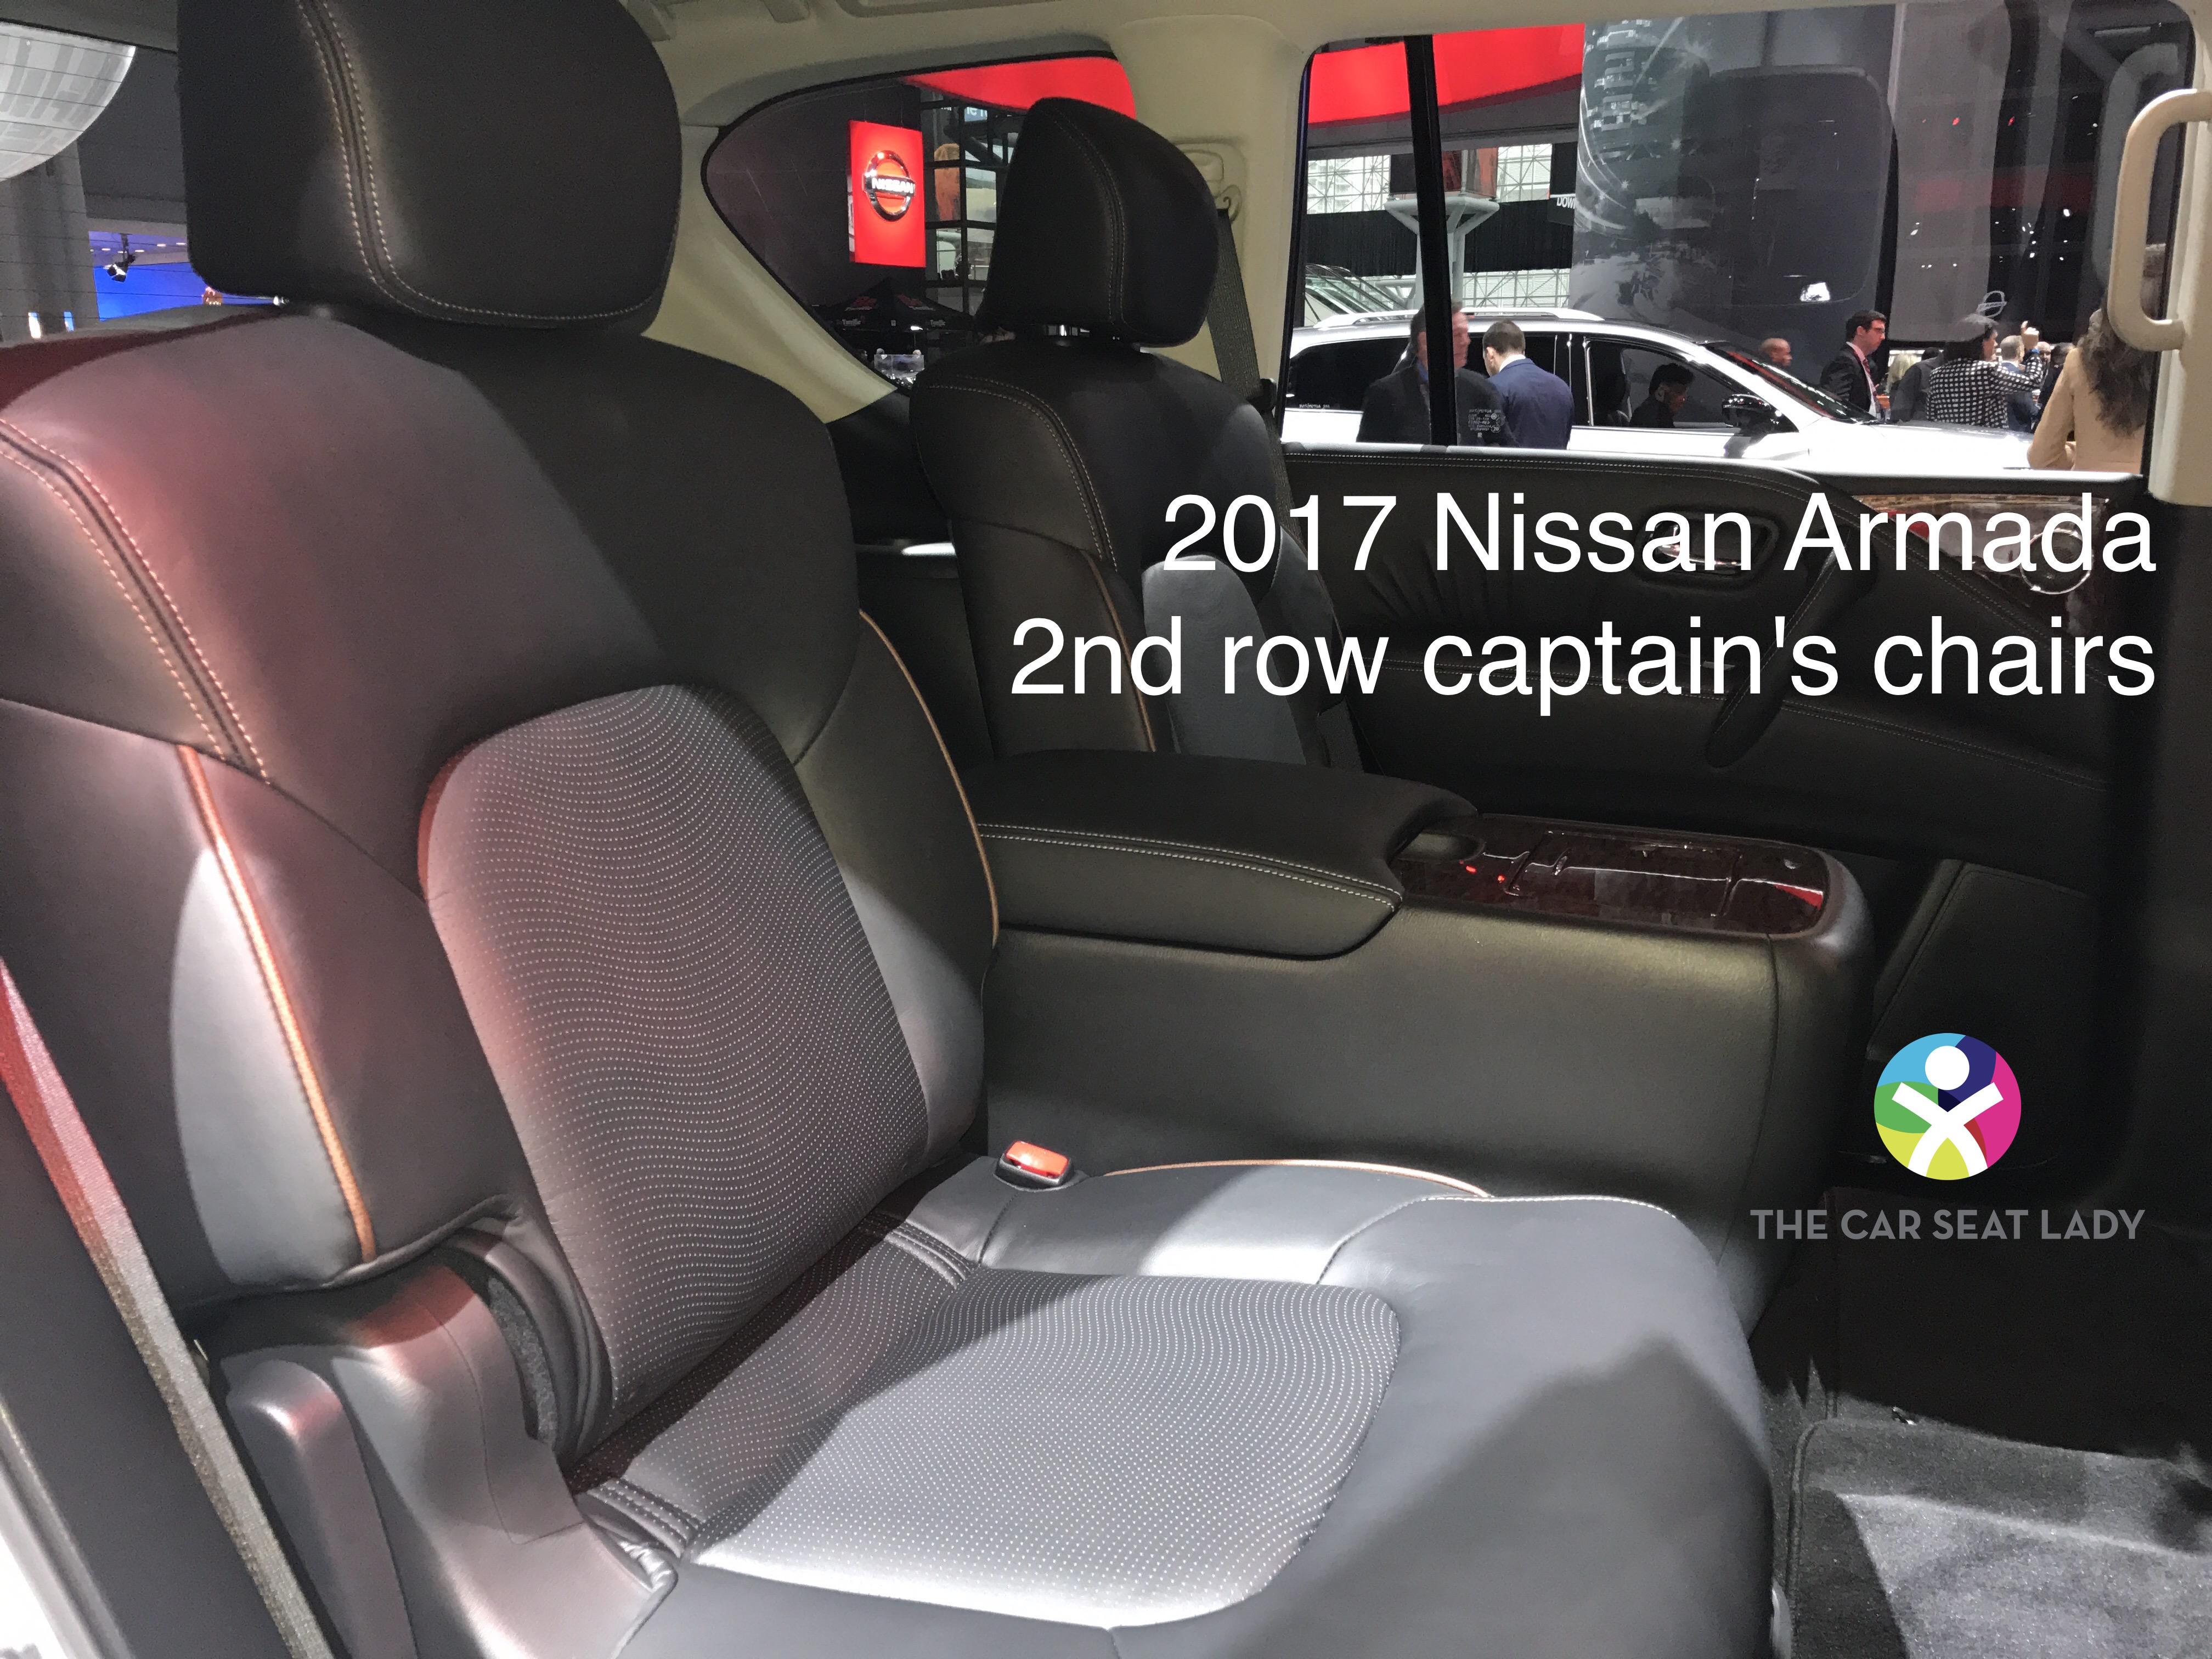 8 Seater Model